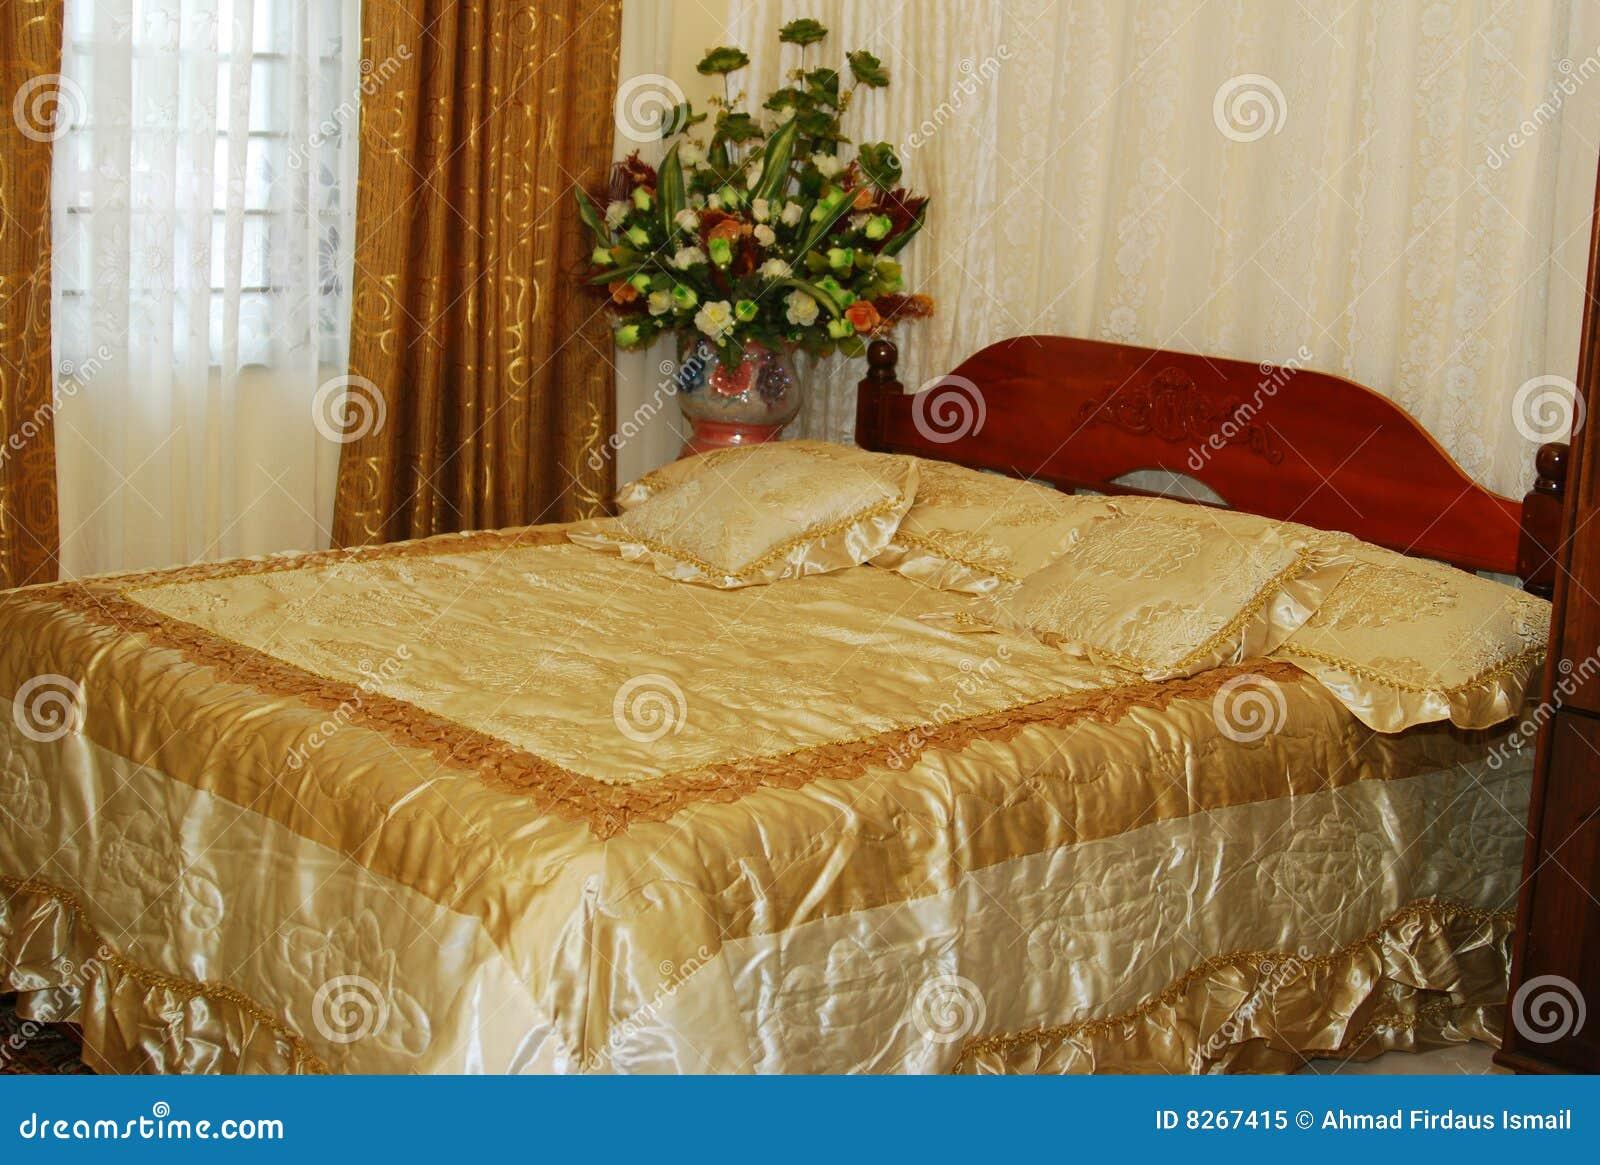 Wedding Bed Royalty Free Stock Photo Image 8267415